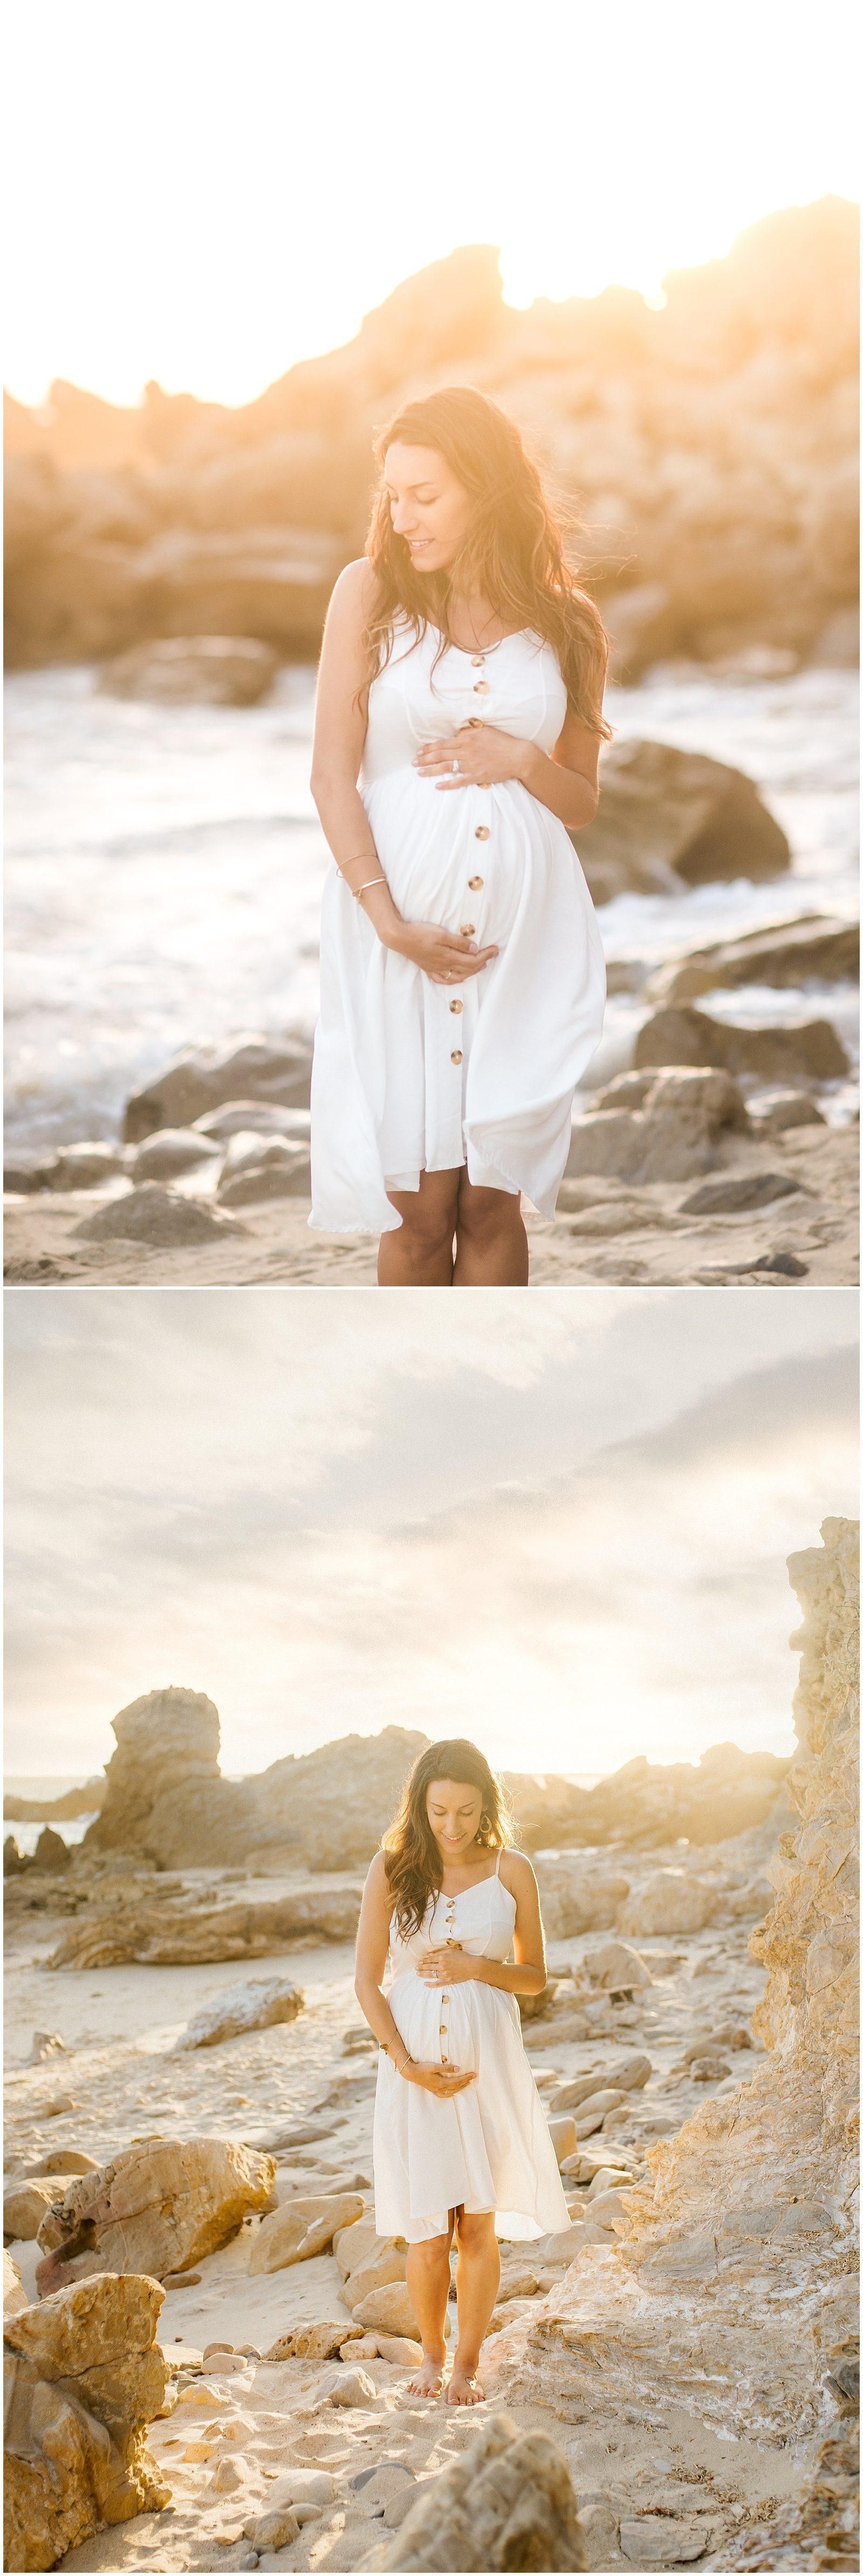 Orange County Maternity Photographer 6